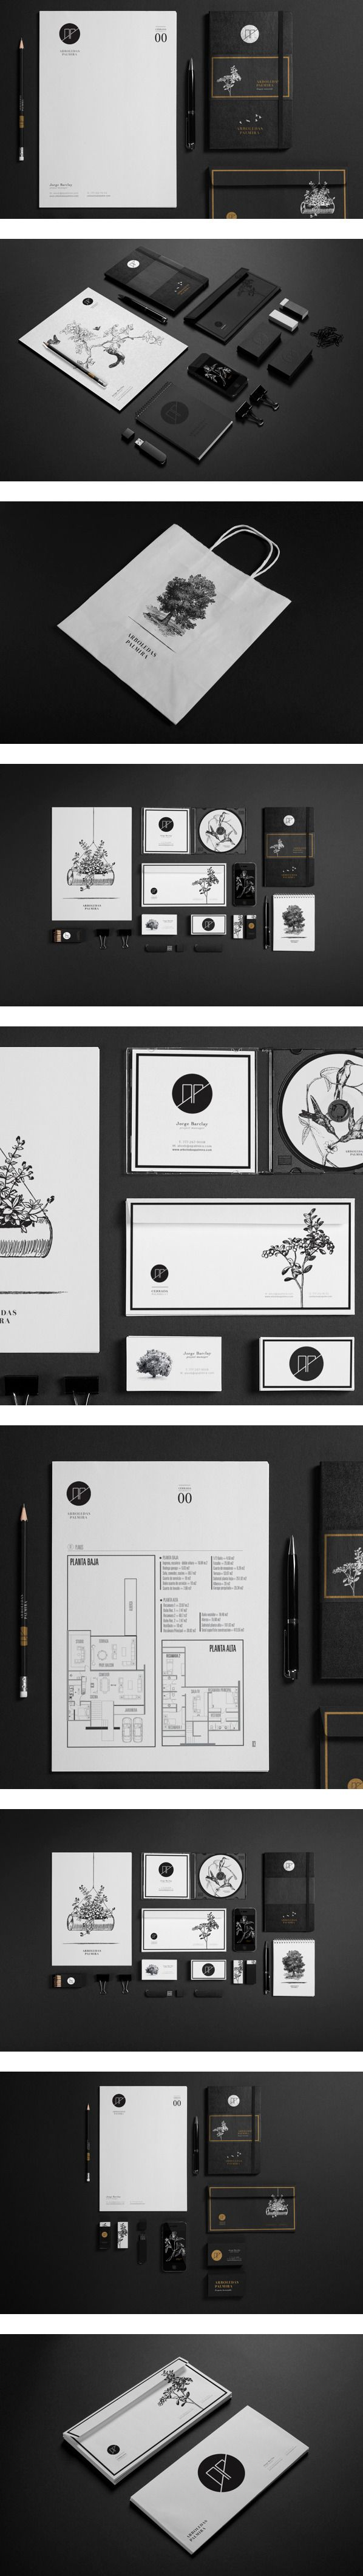 Arboledas Palmira by Diego Leyva, via Behance sustainable community #identity #packaging #branding PD